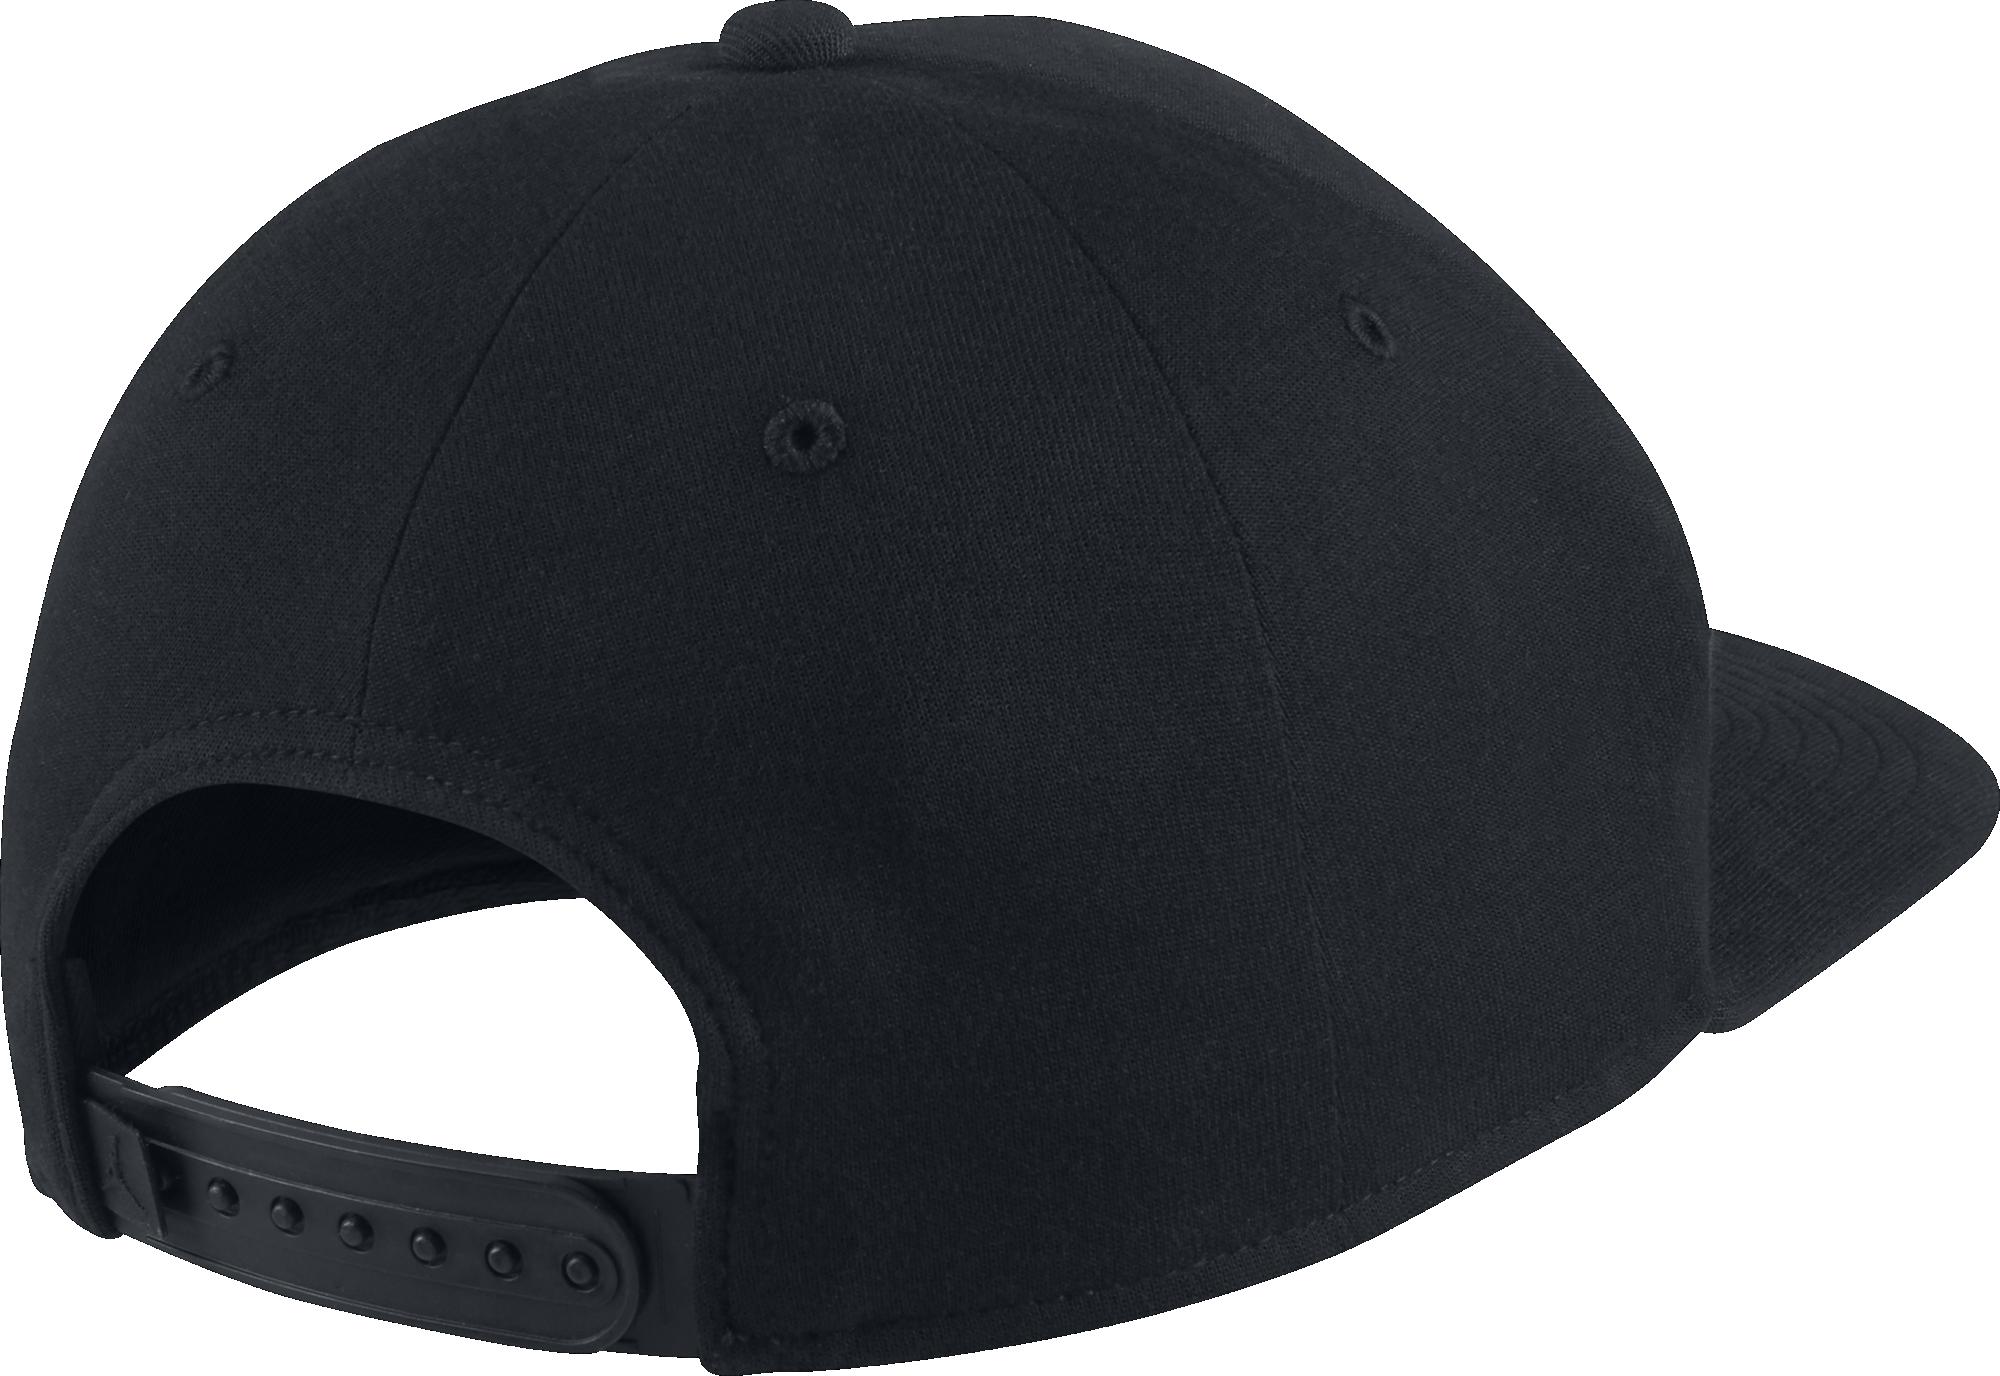 2e7d9d1a42041b NIKE AIR JORDAN 23 LUX SNAPBACK HAT for £30.00